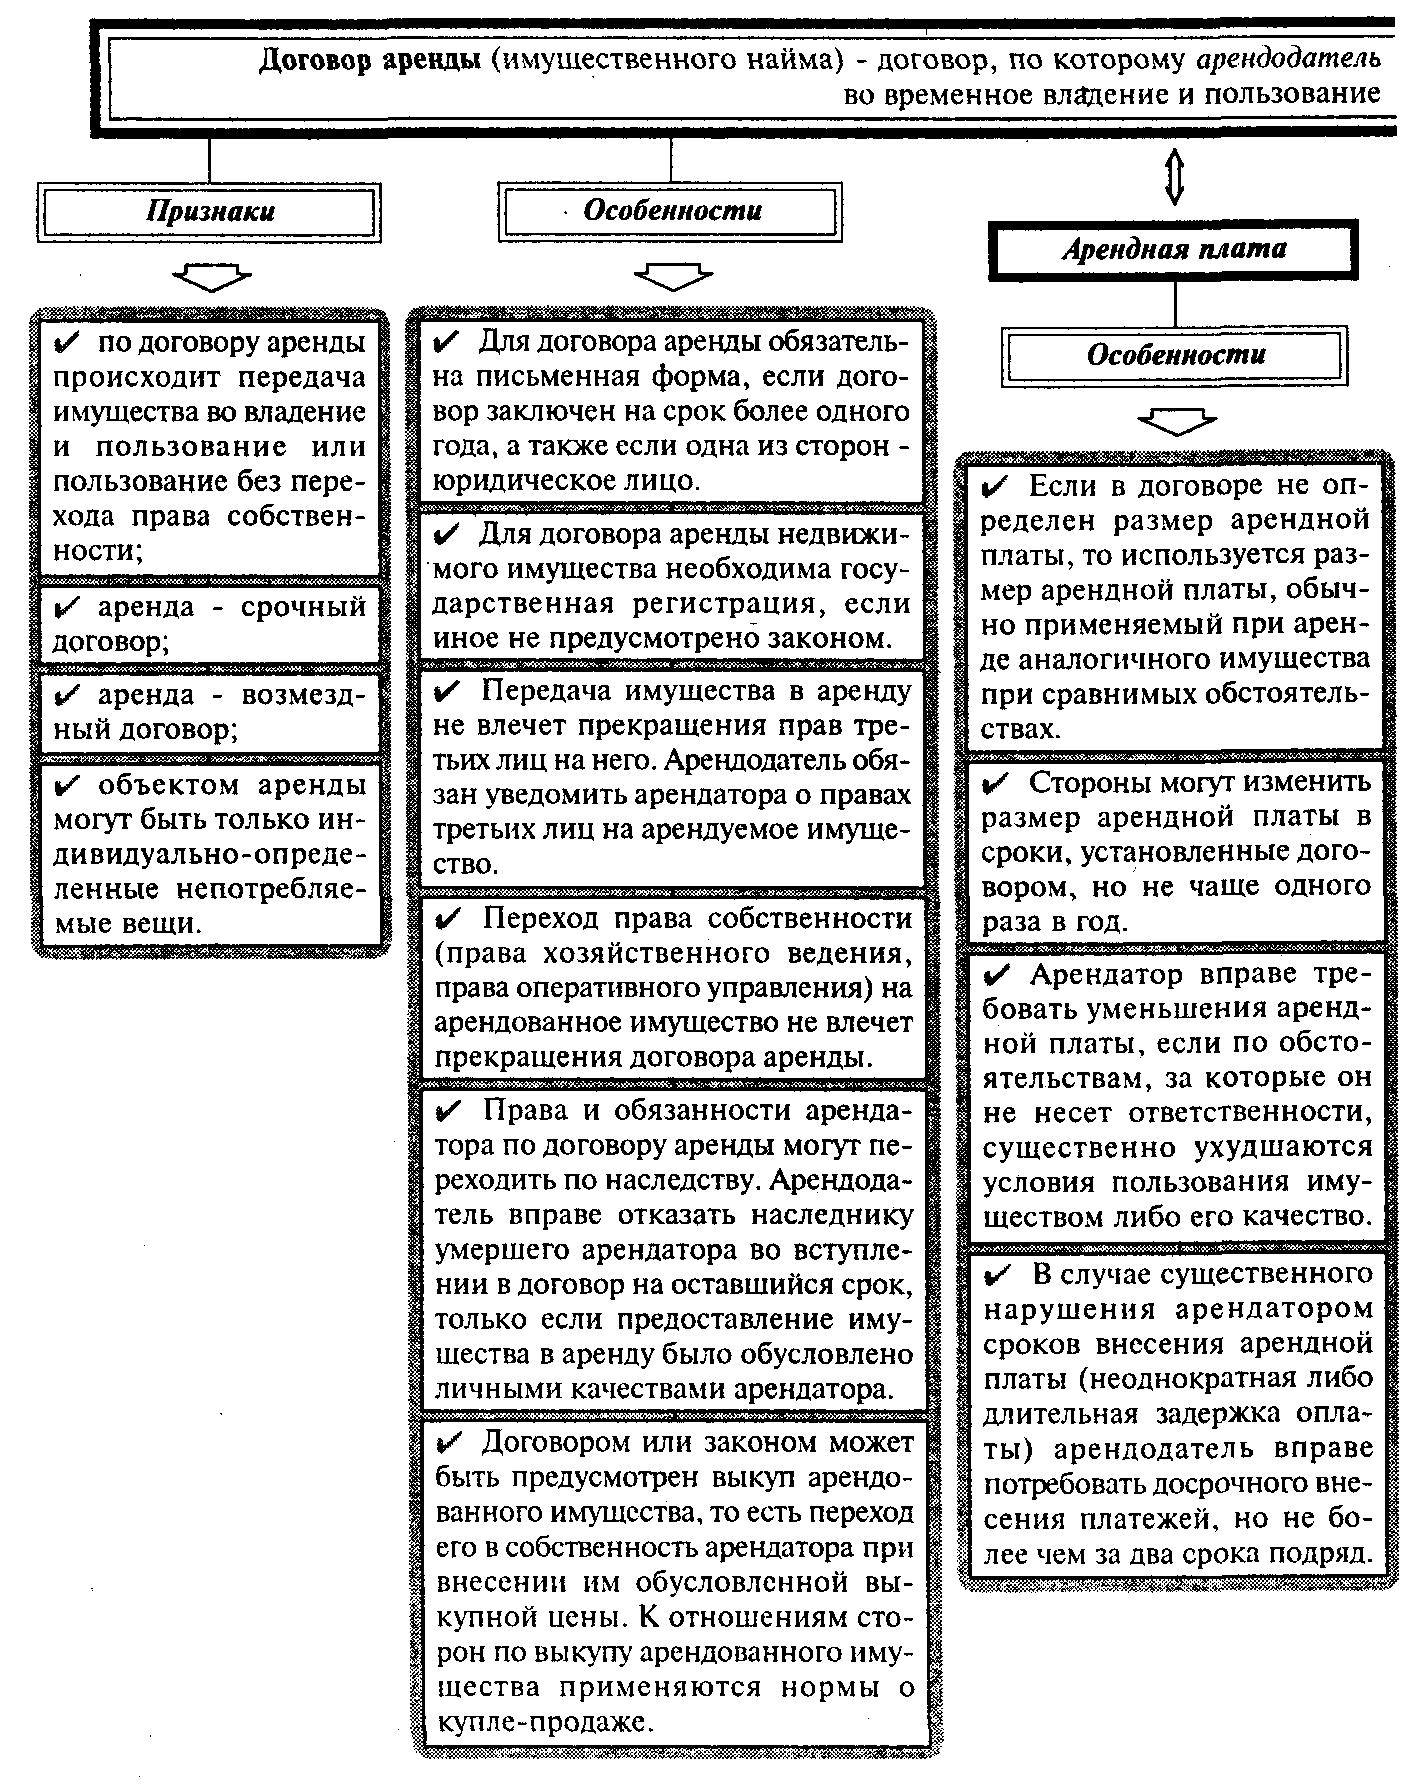 Характеристика договора аренды